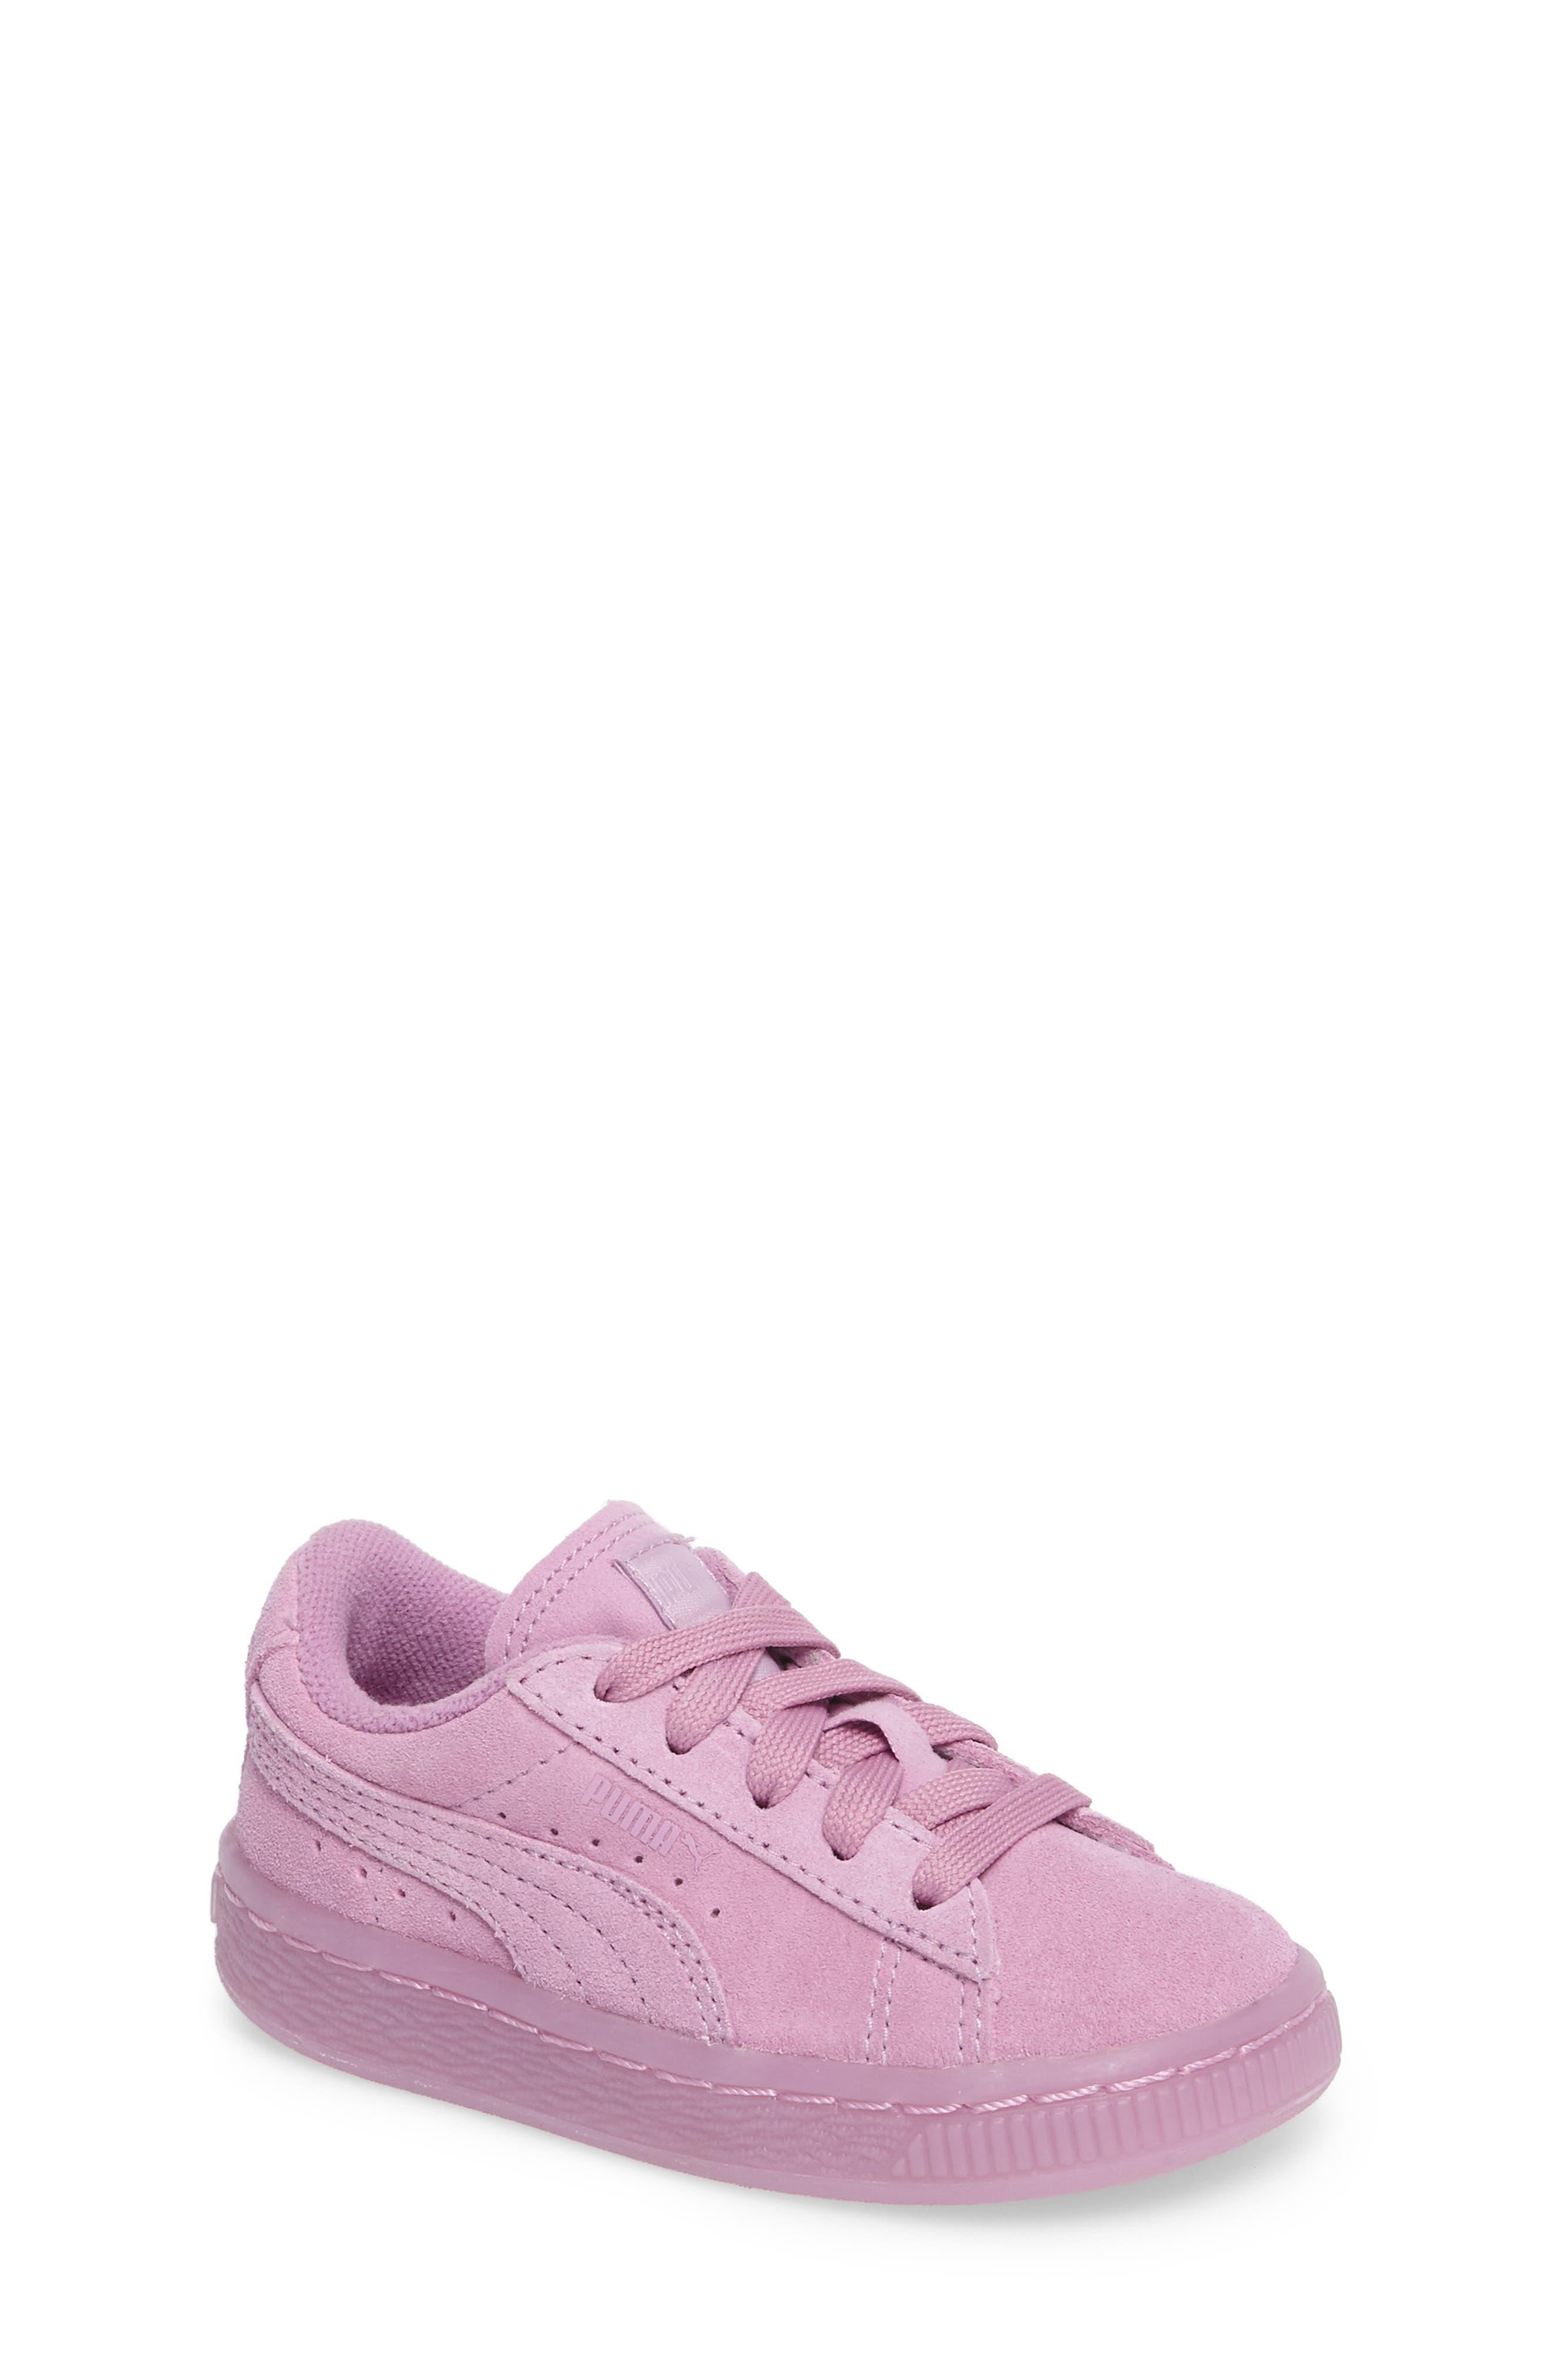 PUMA Suede Iced Sneaker (Baby, Walker & Toddler)